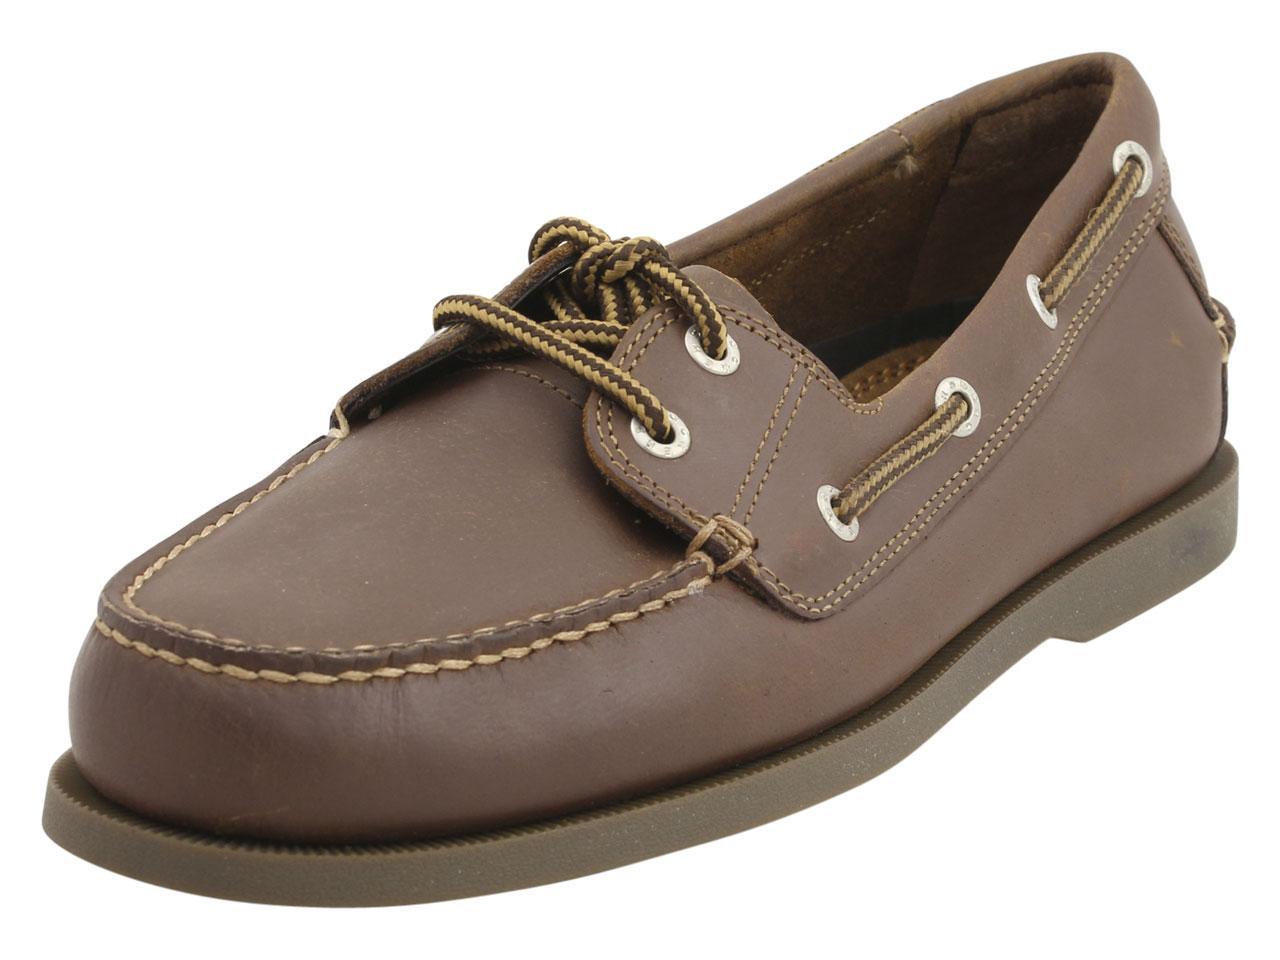 Image of Dockers Men's Vargas Loafers Boat Shoes - Brown - 9 D(M) US